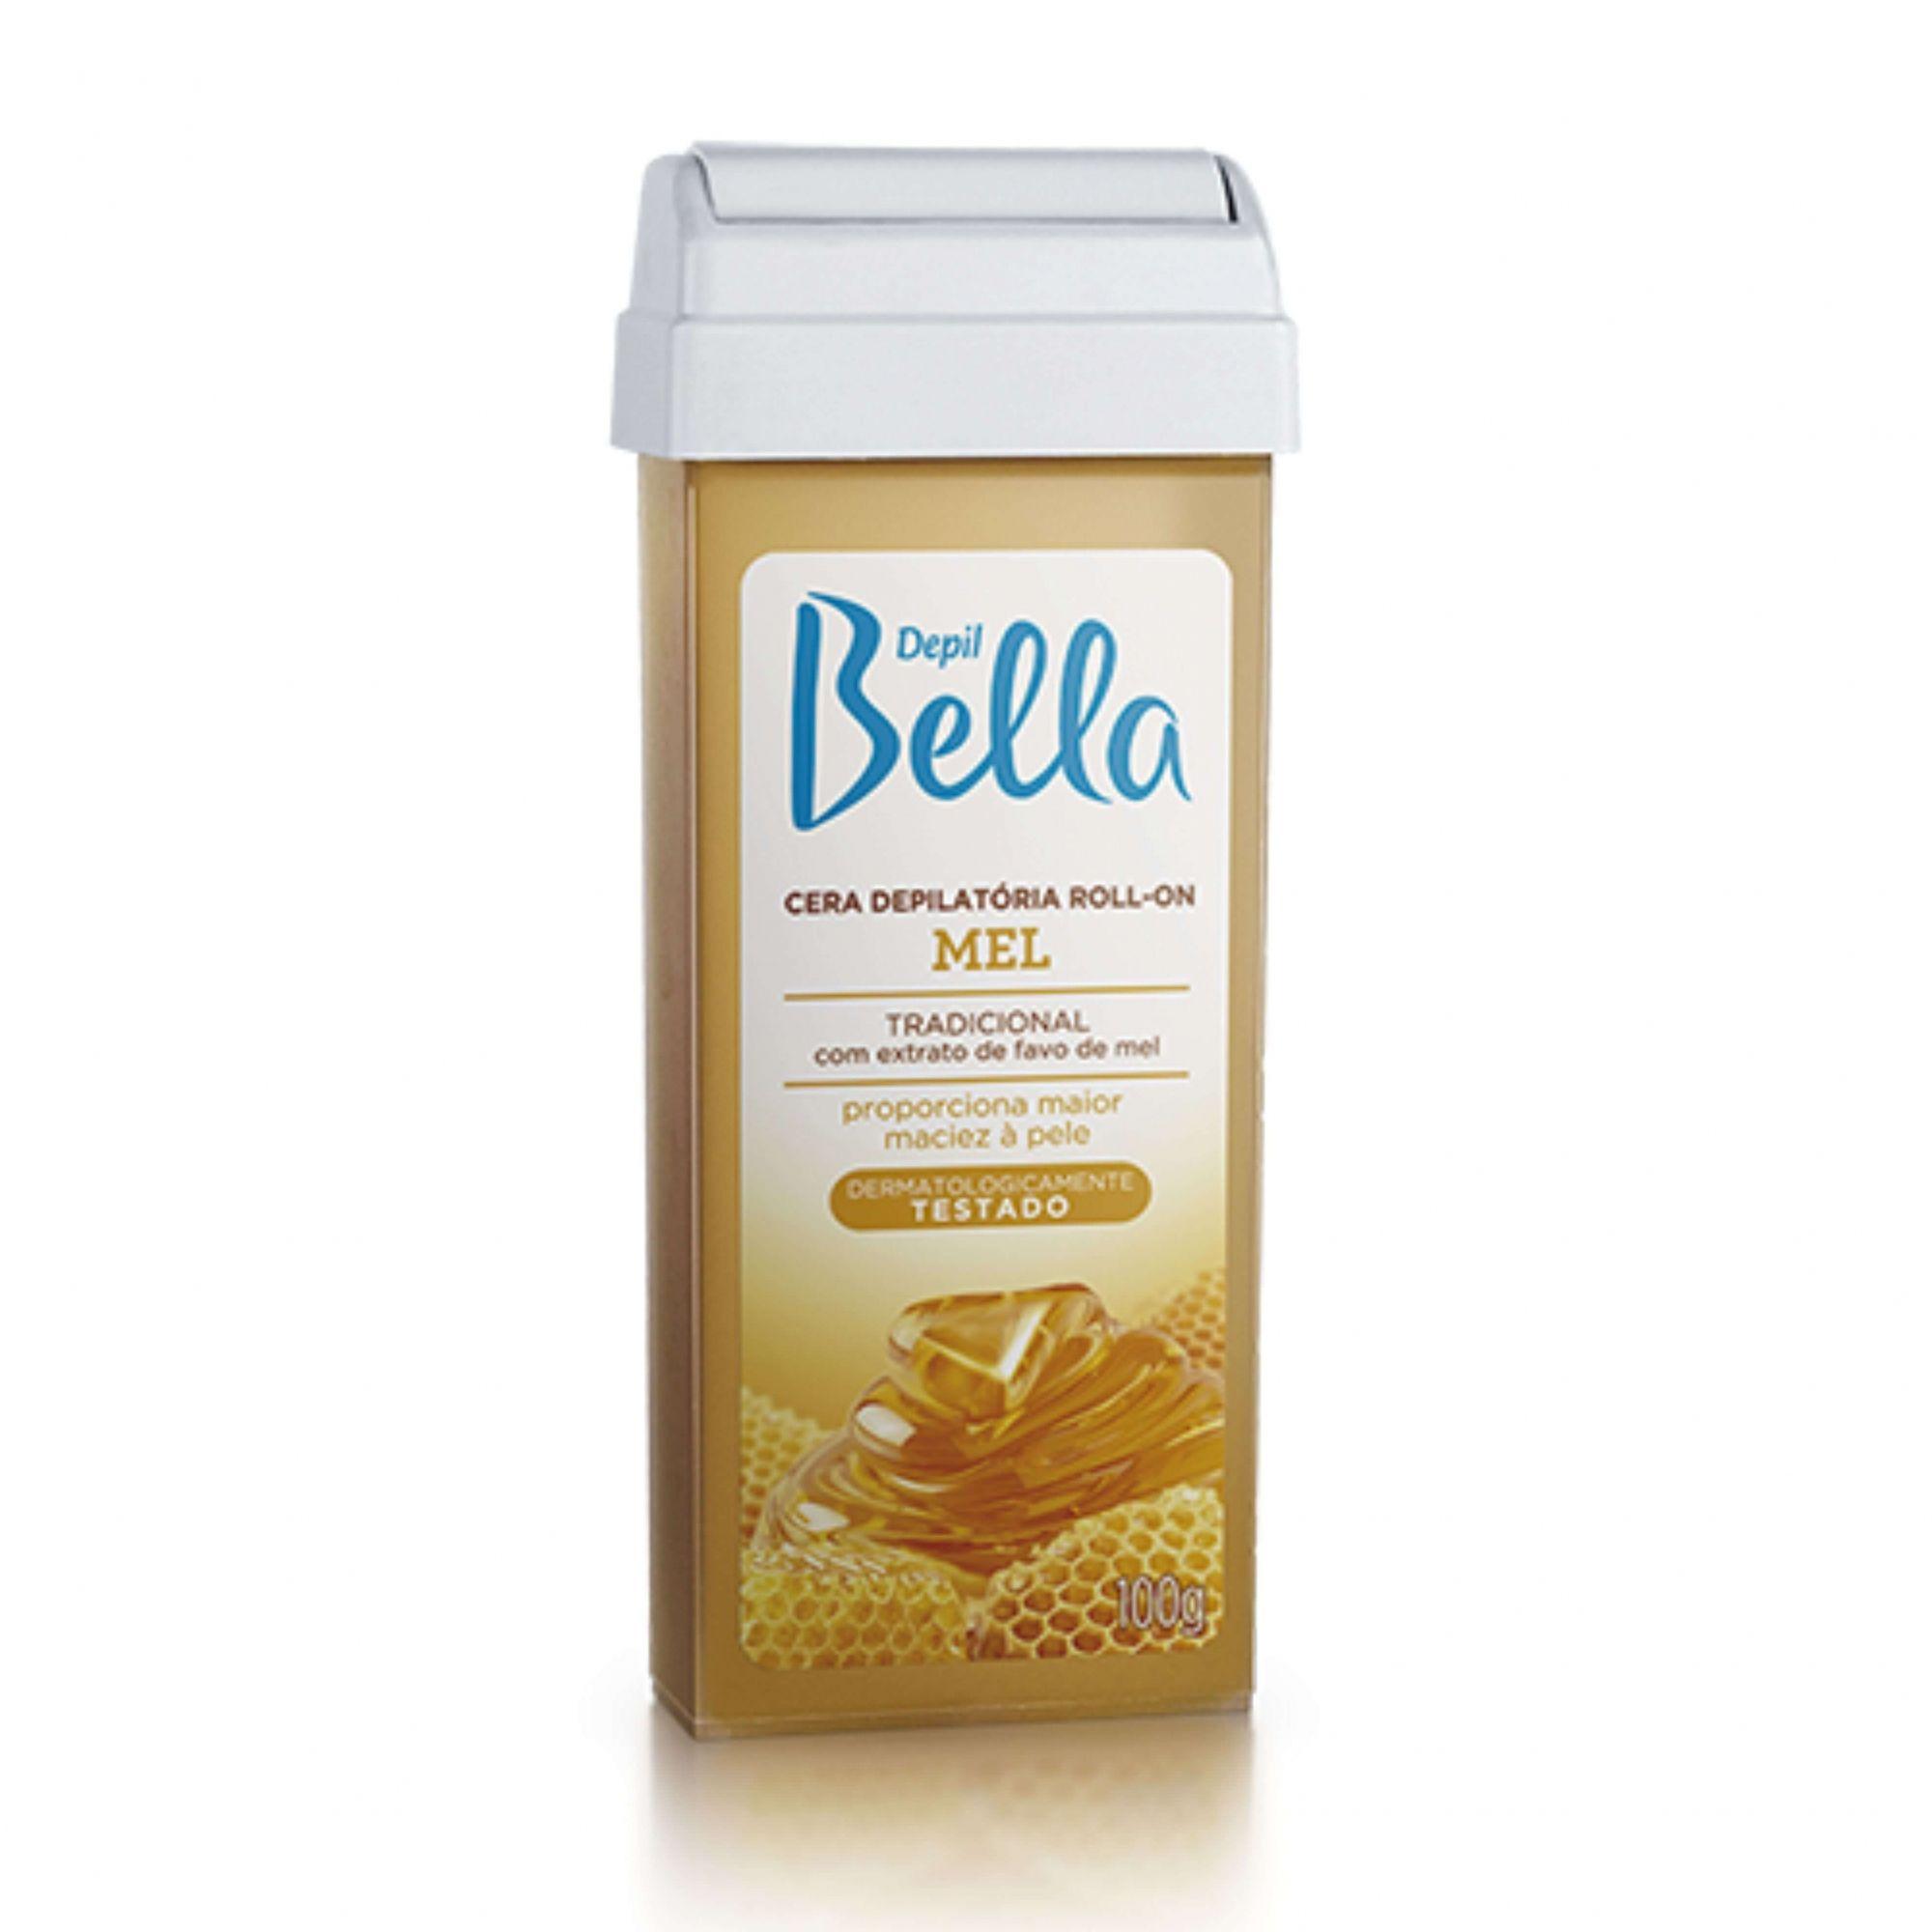 Refil Cera Depilatória Roll-on Mel Depil Bella 100g